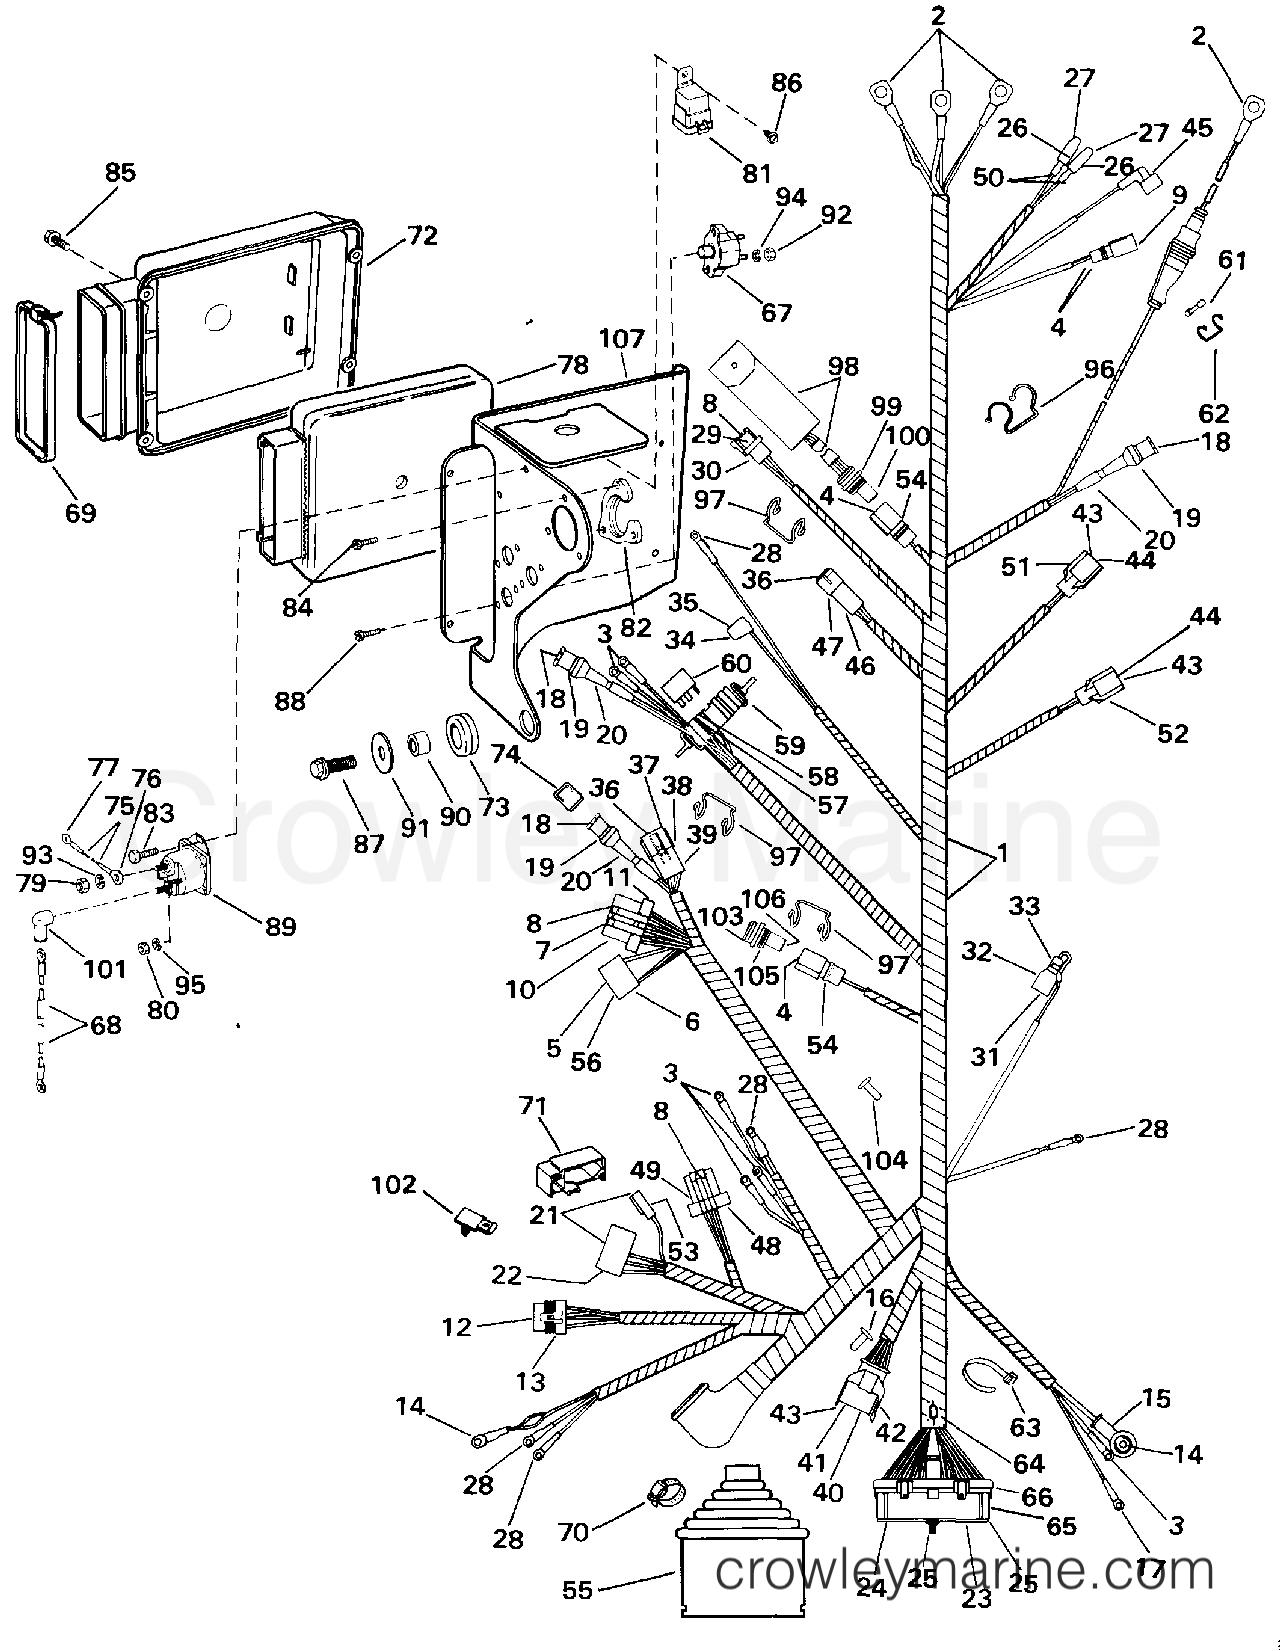 1994 OMC Stern Drive 5.8 - 58FBDPMDA - ENGINE WIRE HARNESS & BRACKET